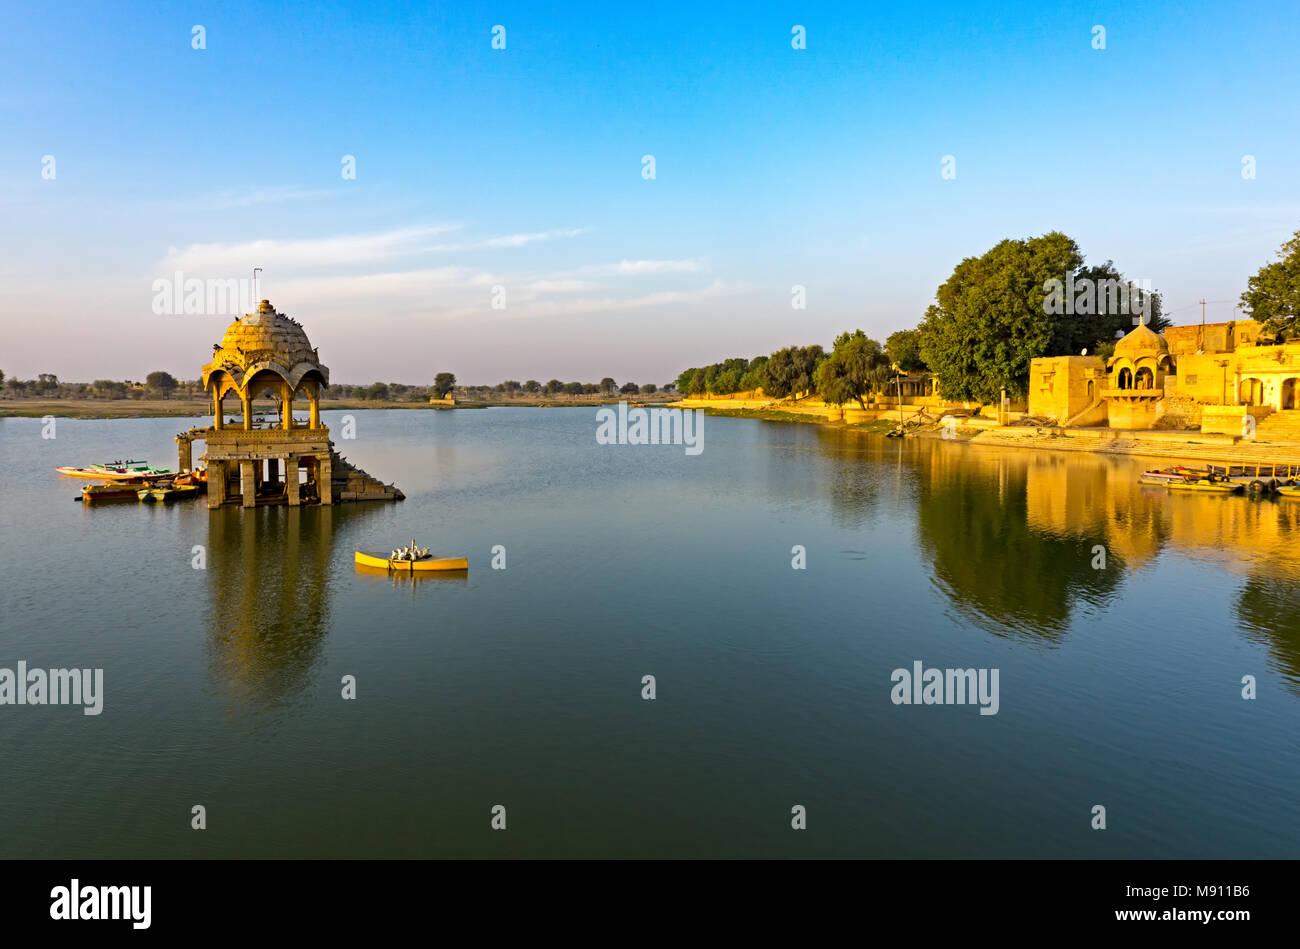 View of Gadi Sagar temple at Gadisar lake in Jaisalmer, Rajasthan, India. Stock Photo